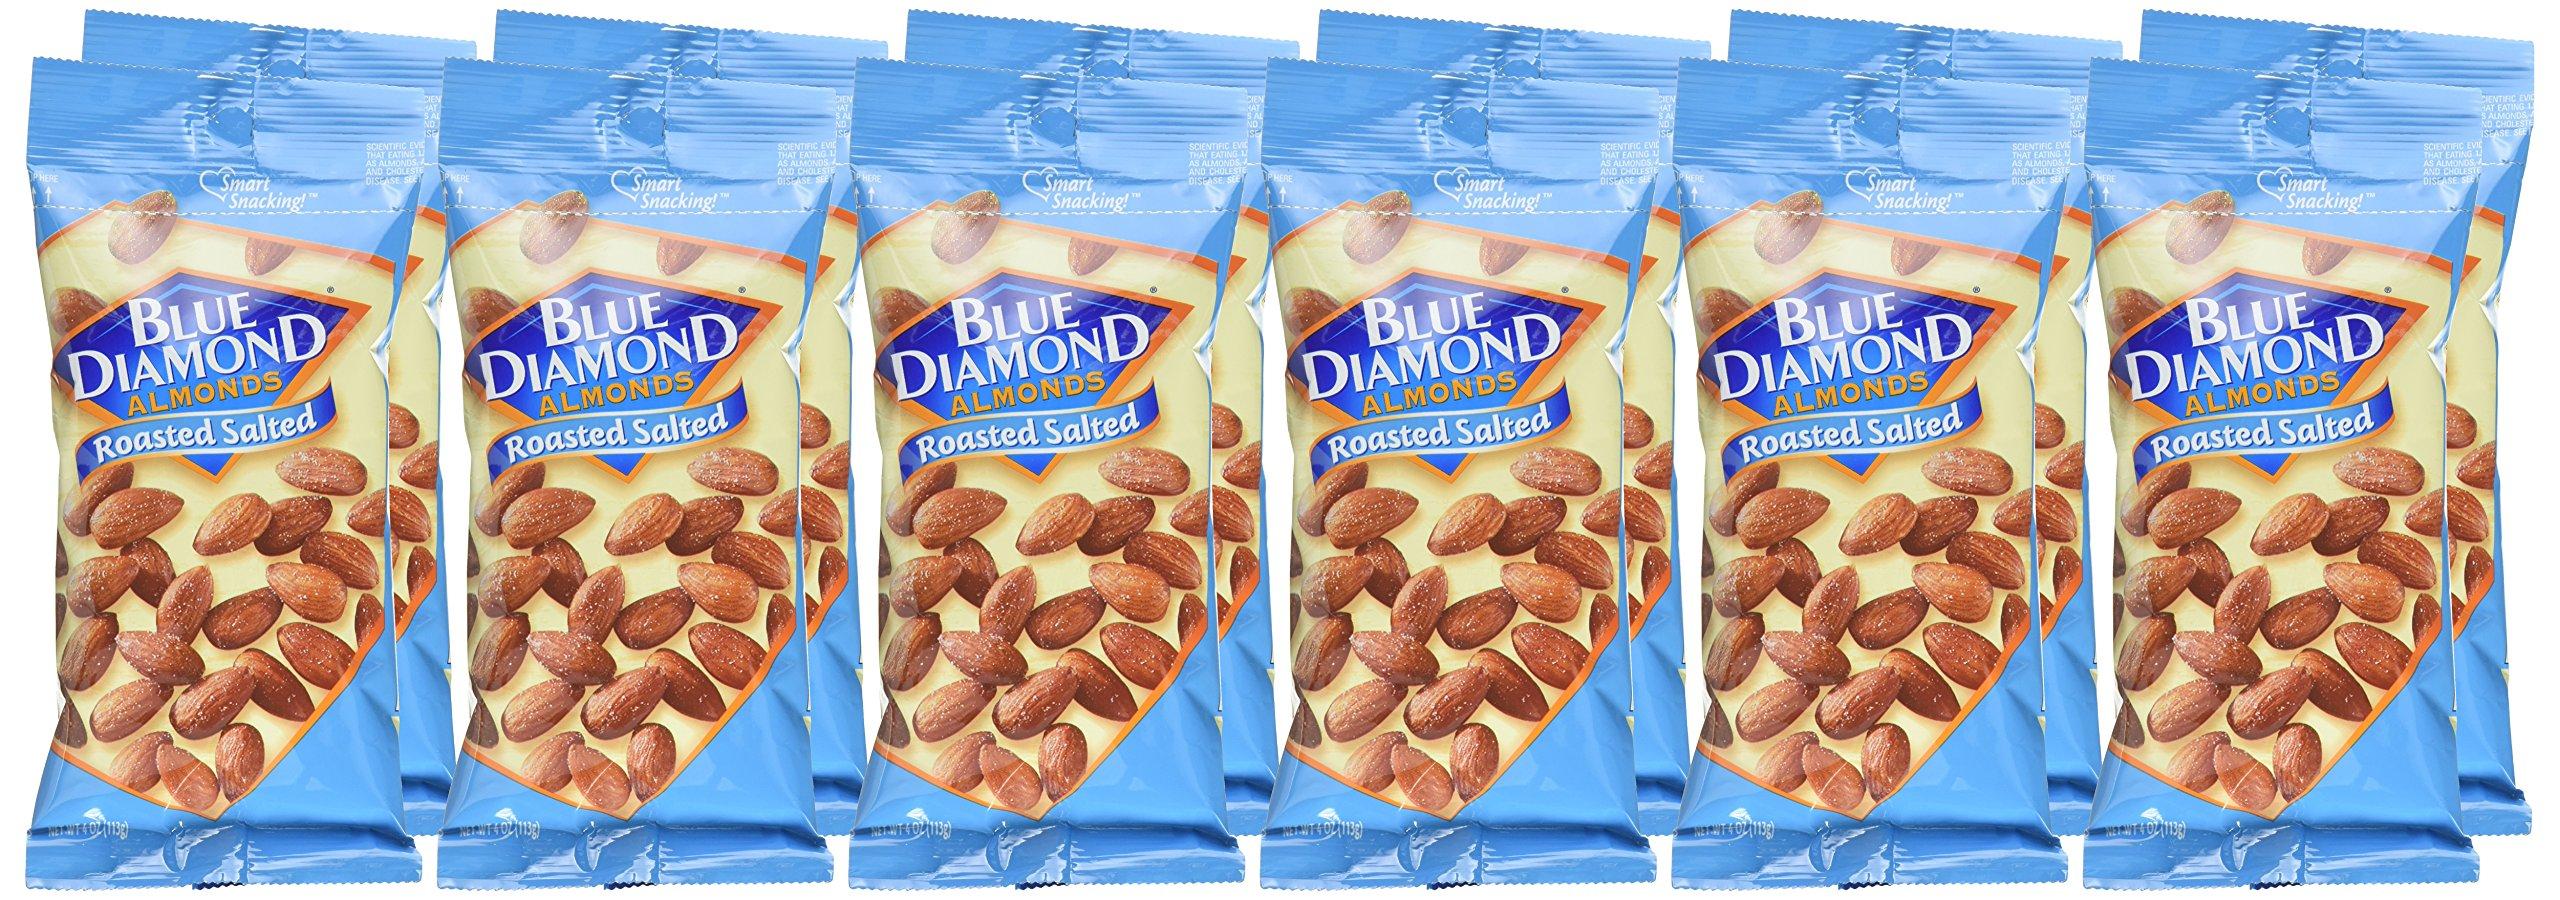 Blue Diamond Almonds, Roasted Salted, 4 oz, 12 Count by Blue Diamond Almonds (Image #2)